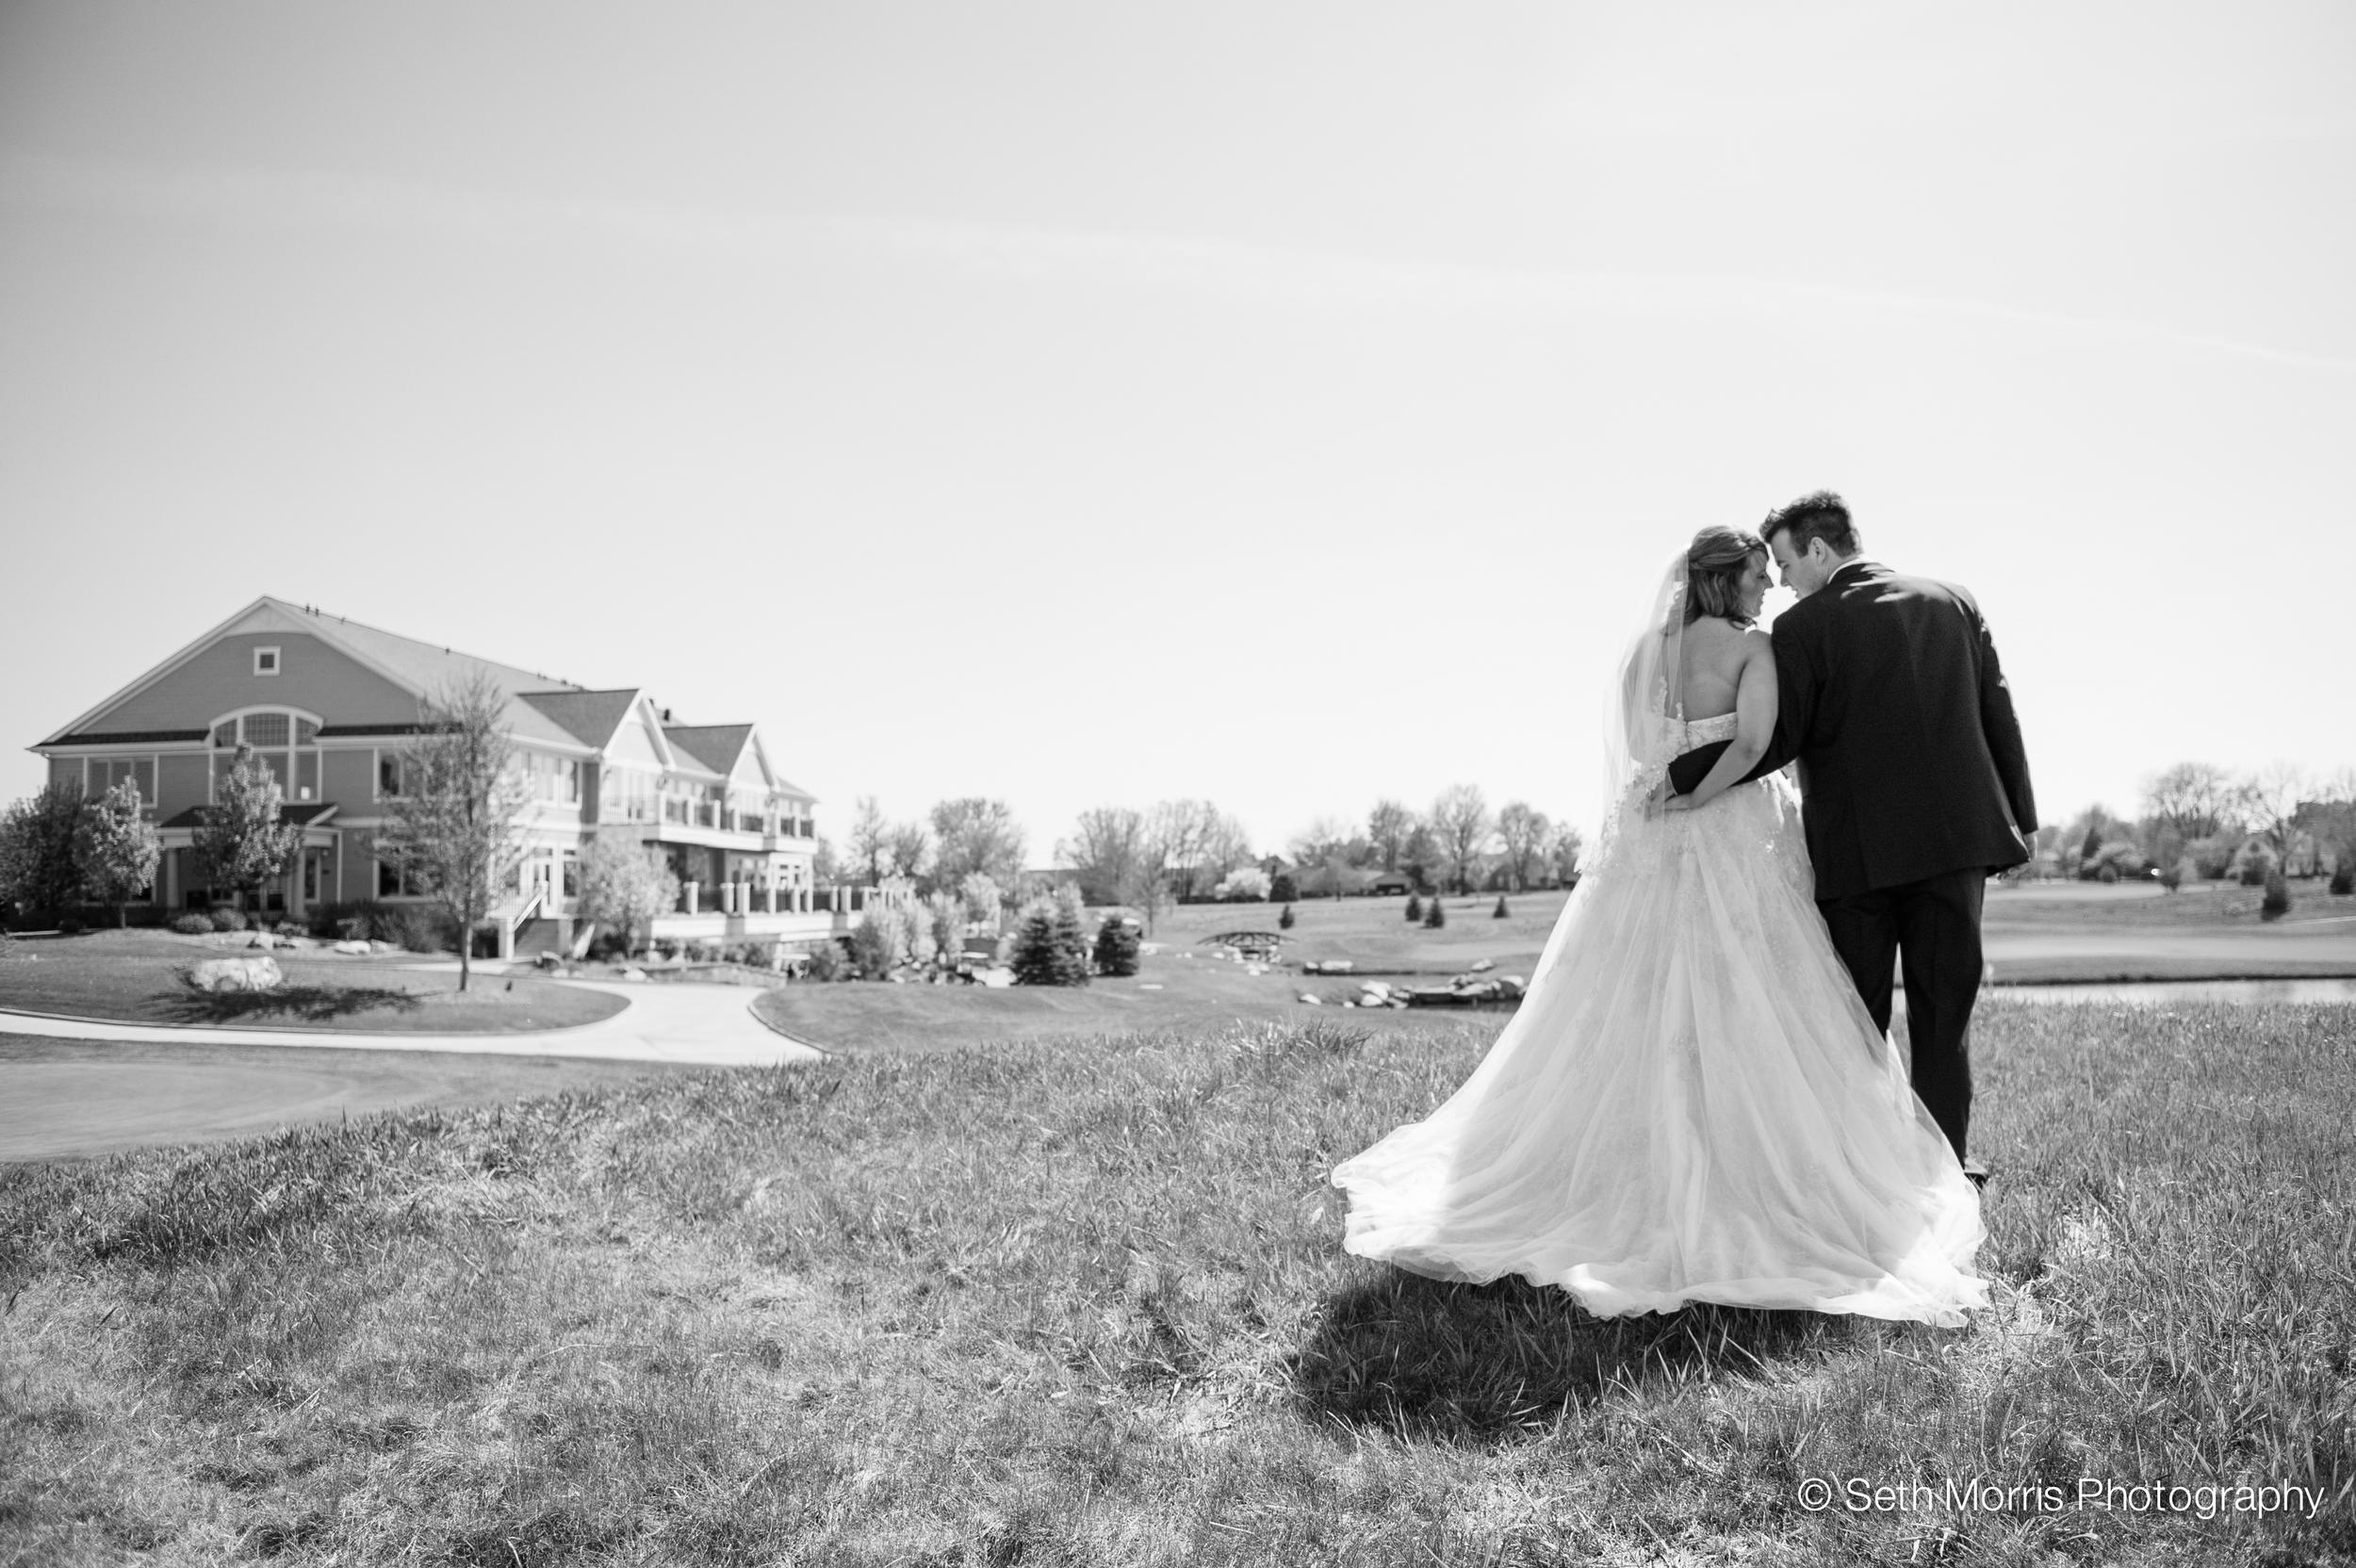 metamora-fields-wedding-photographer-peoria-128.jpg